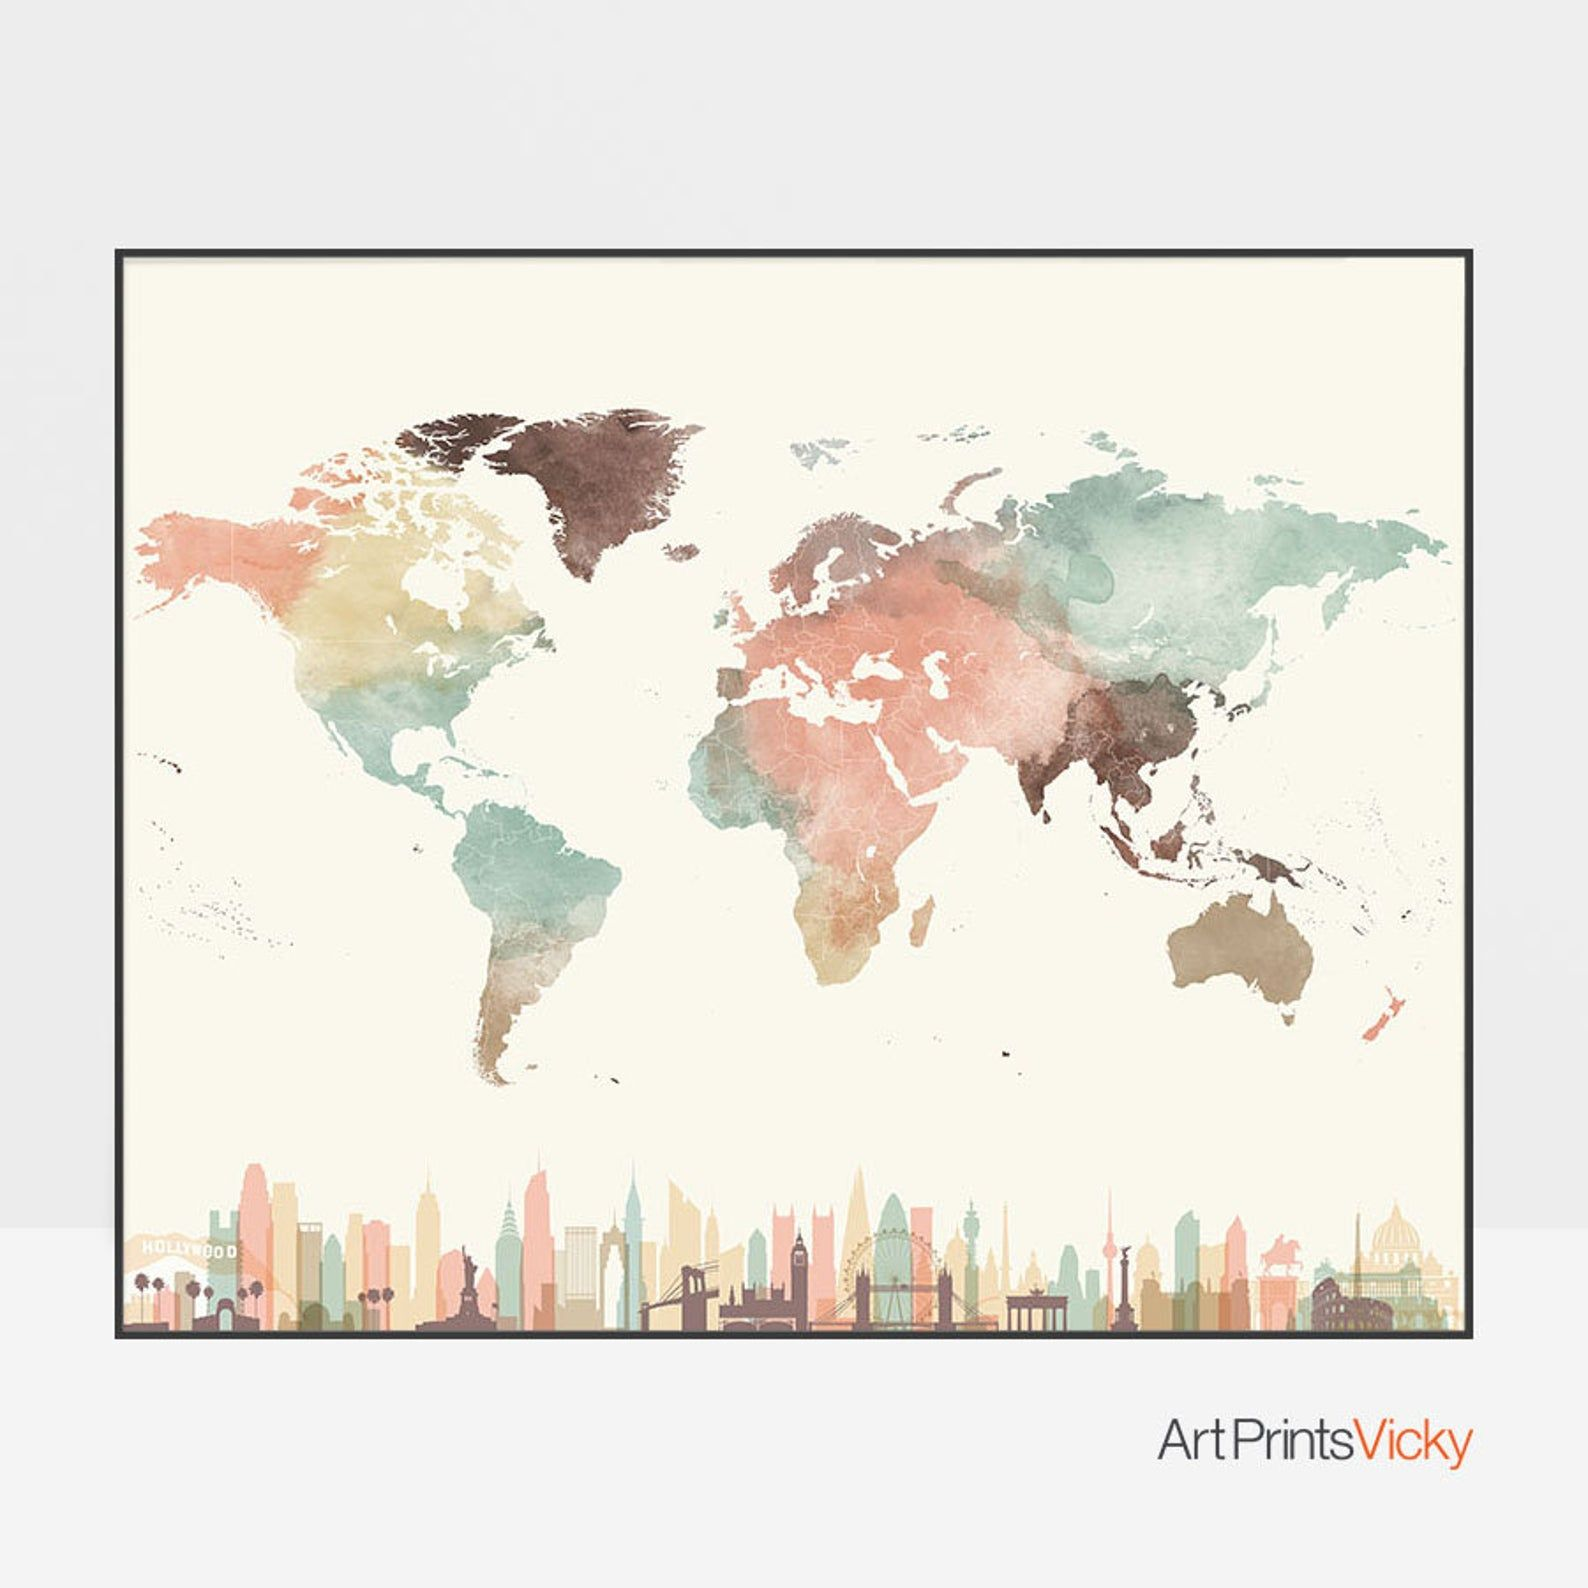 World map, world map poster, Travel map, skyline wall art